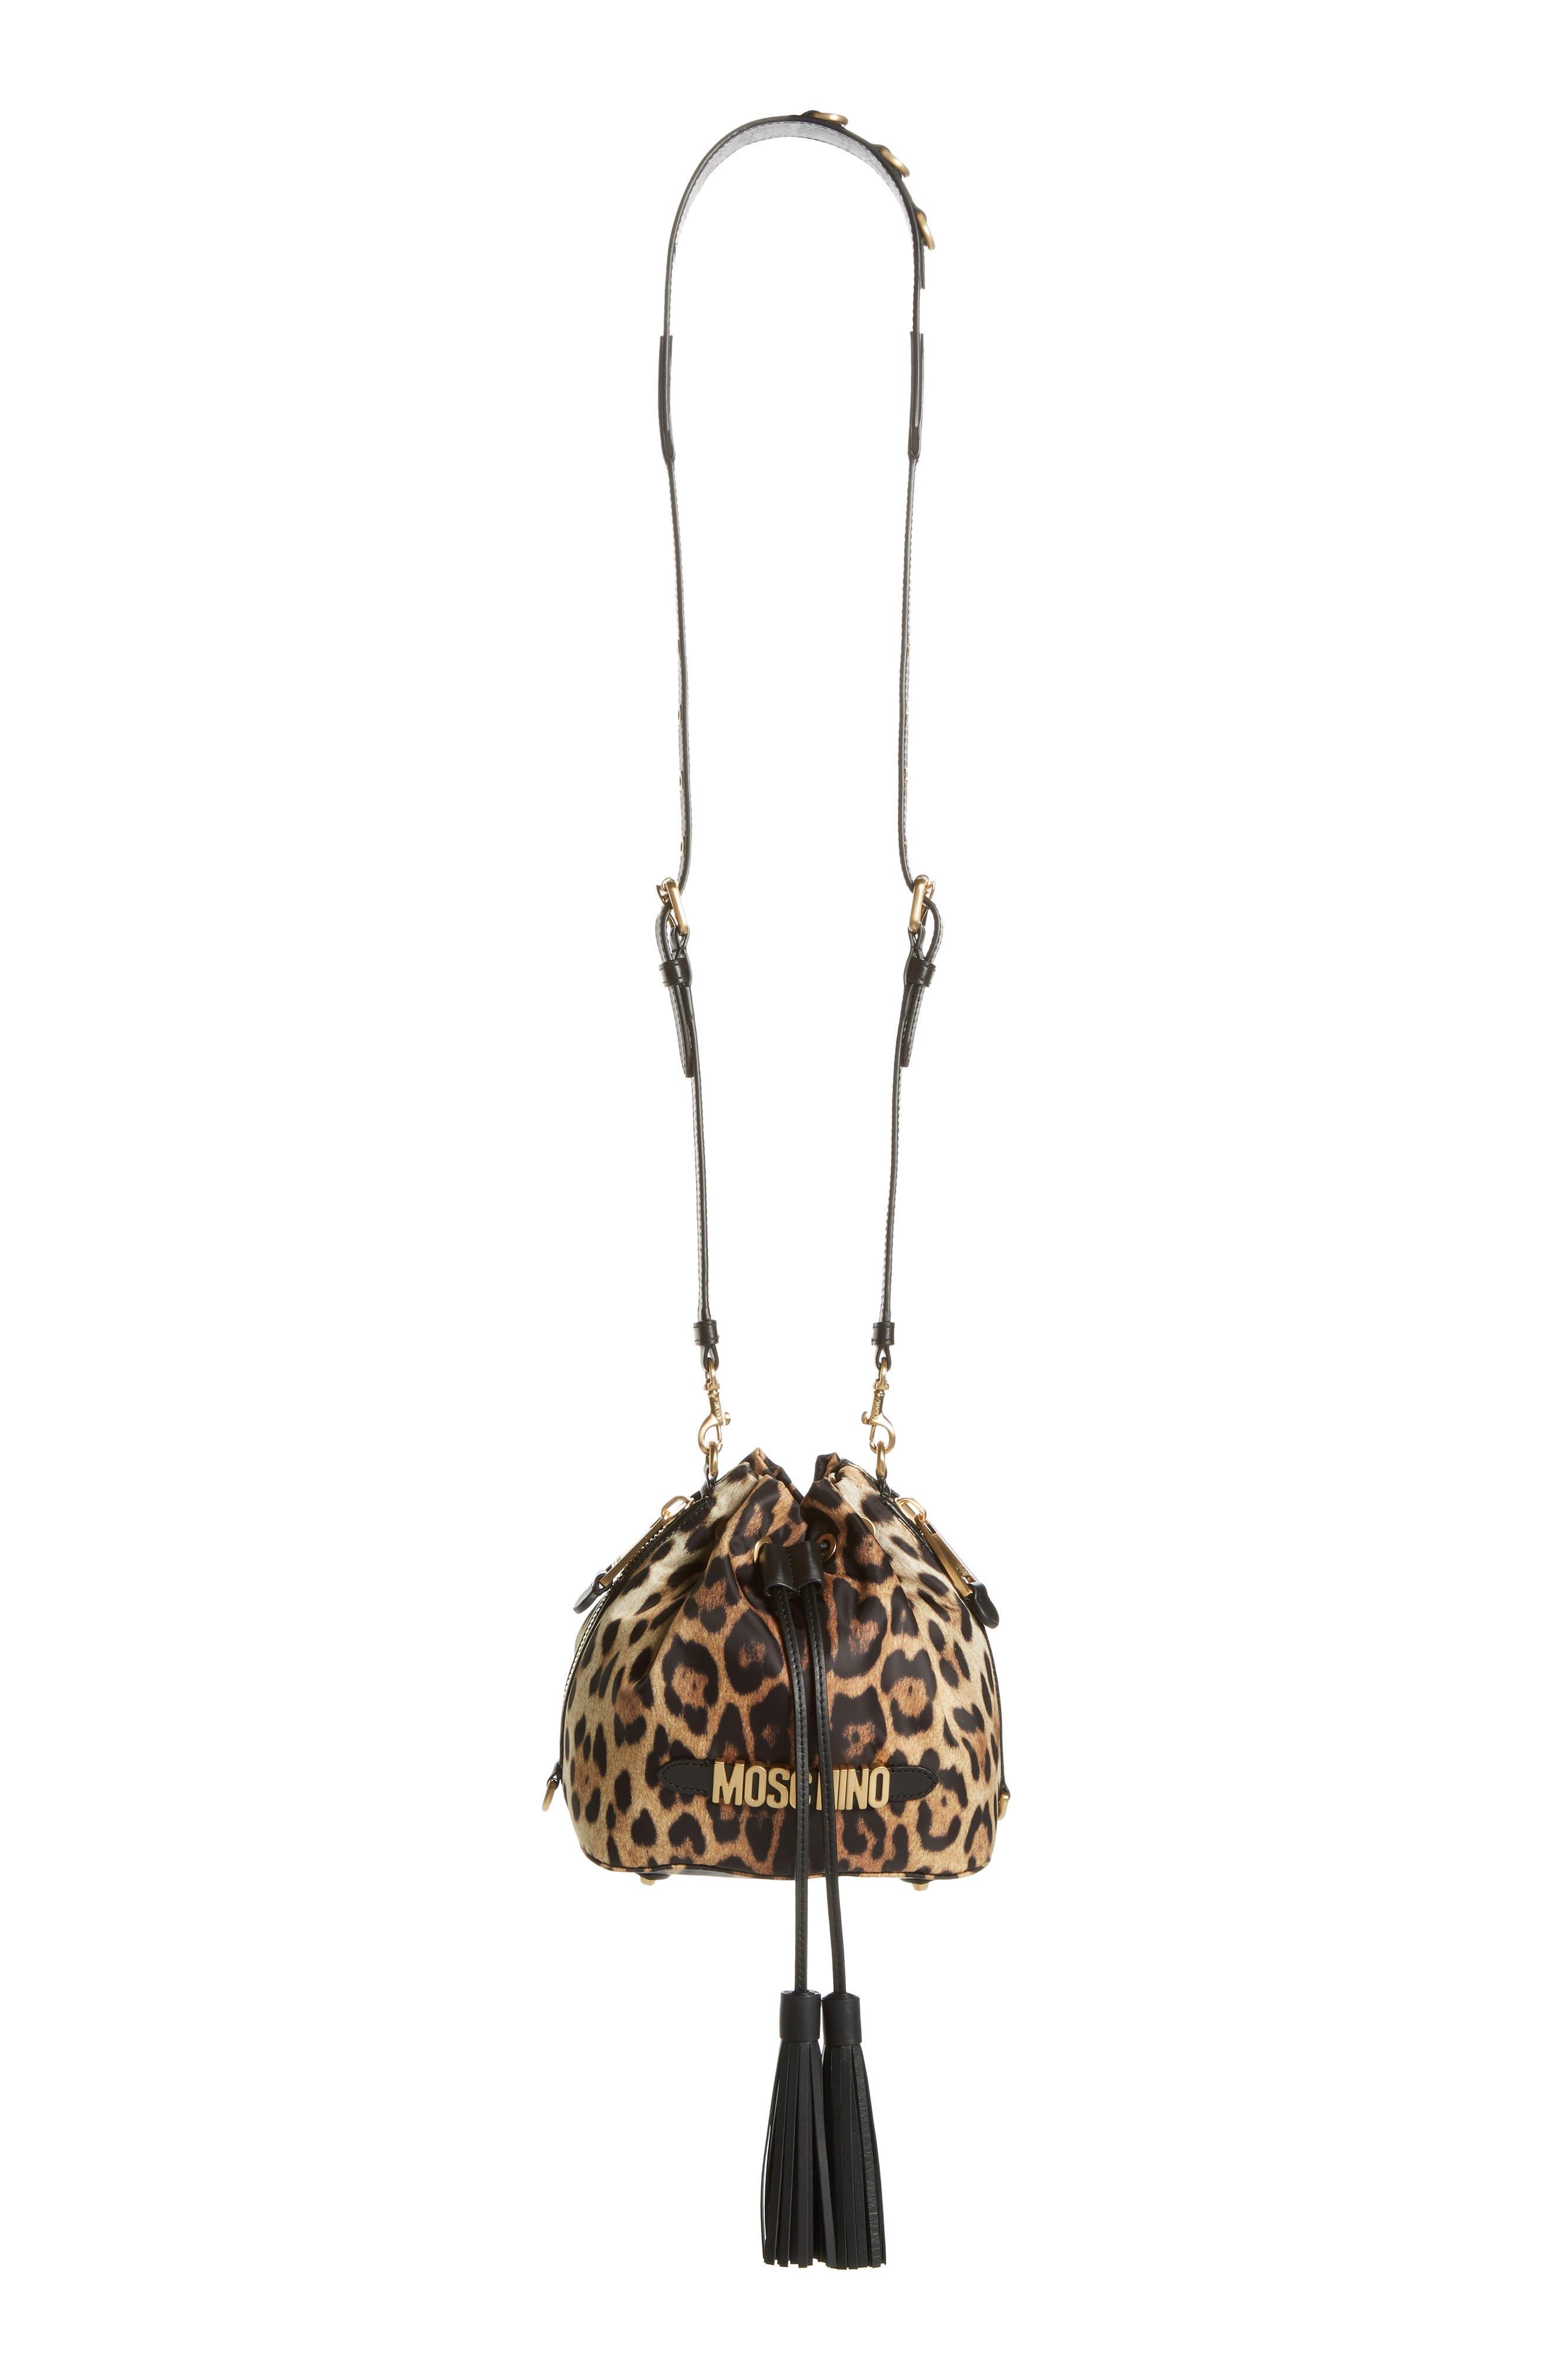 MOSCHINO, Leopard Print Nylon Convertible Bucket Bag, Alternate thumbnail 2, color, BLACK